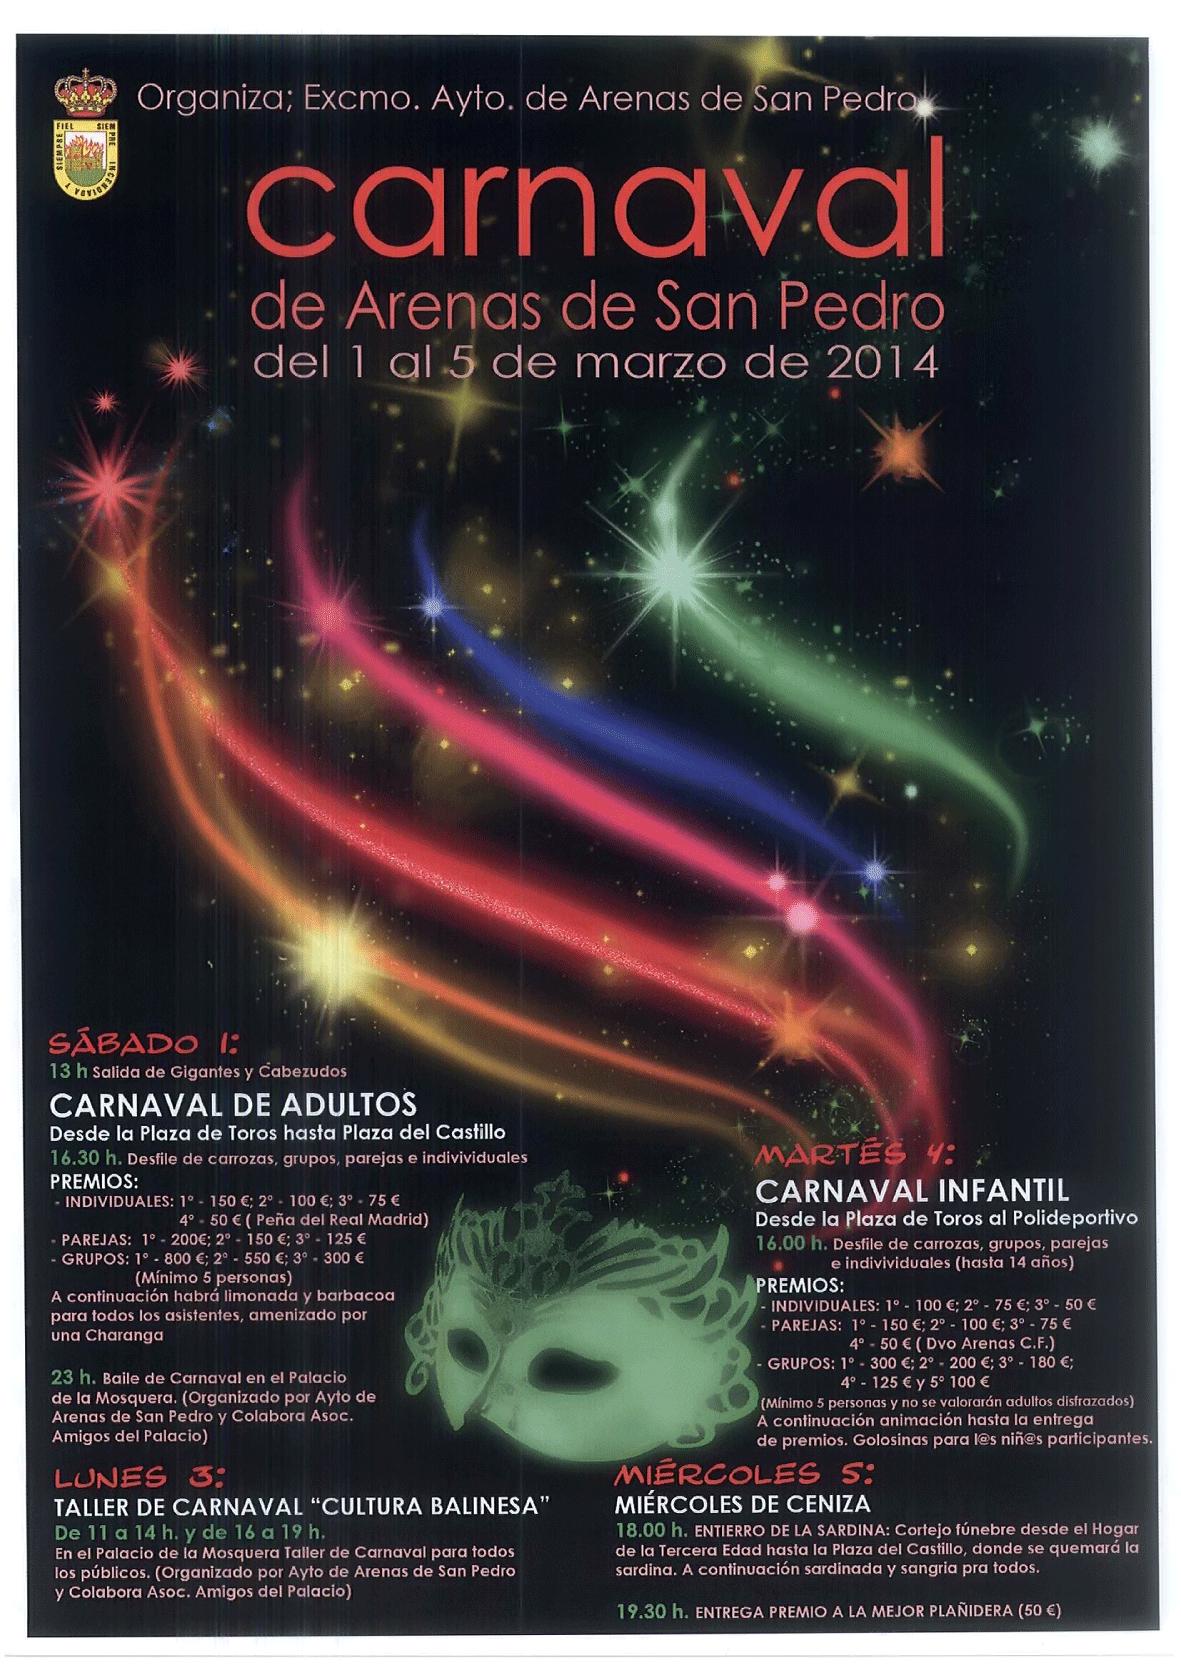 Carnaval en Arenas de San Pedro 2014 - TiétarTeVe